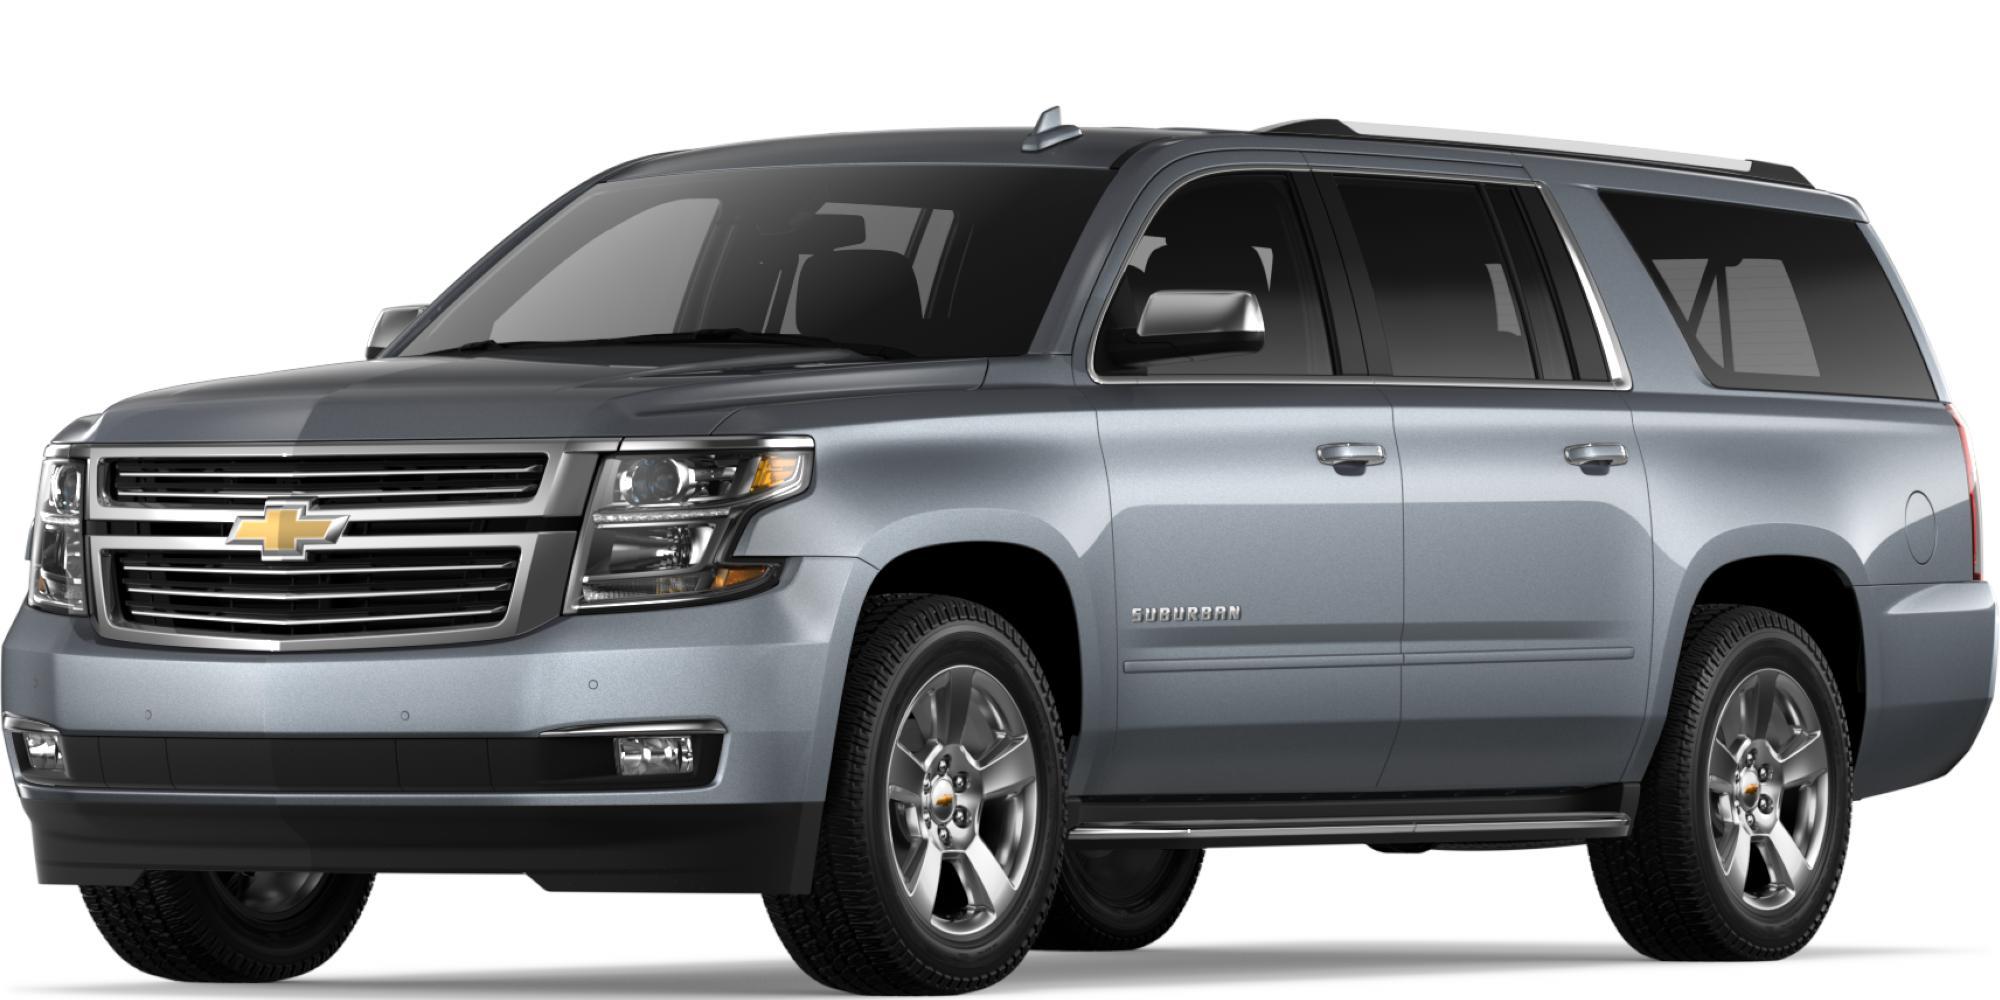 2018 Chevrolet Suburban for sale near Sacramento | John L ...